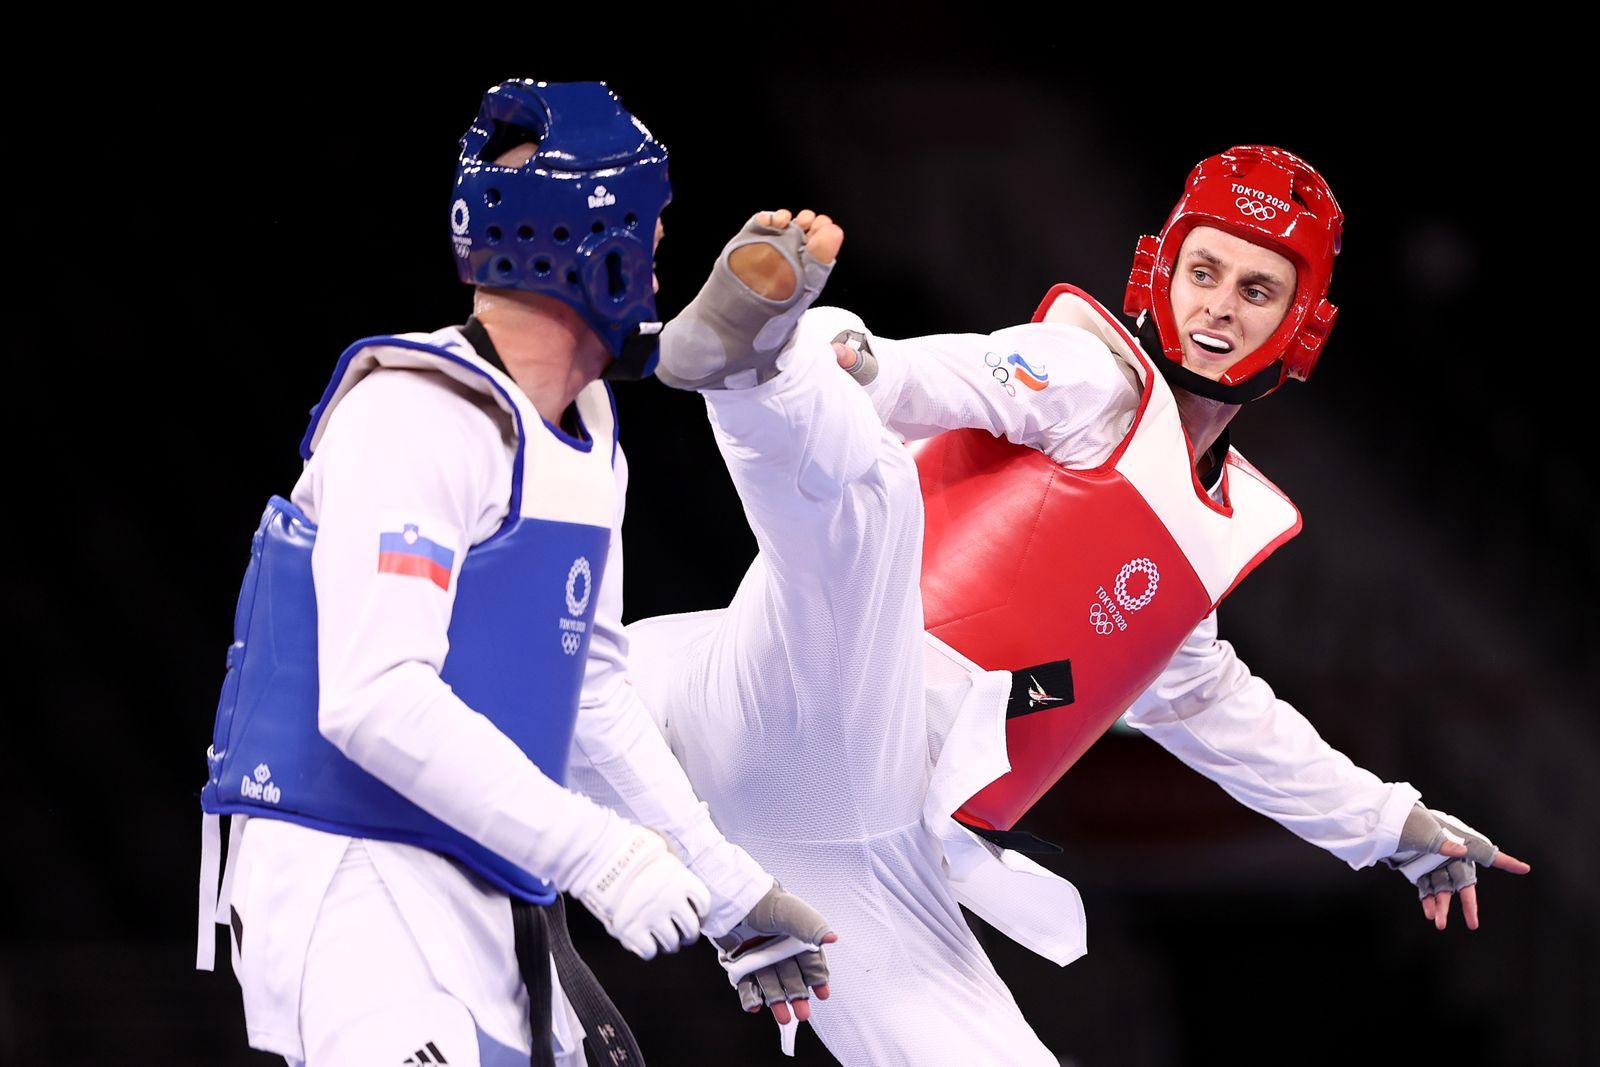 Taekwondo - Olympics: Day 4